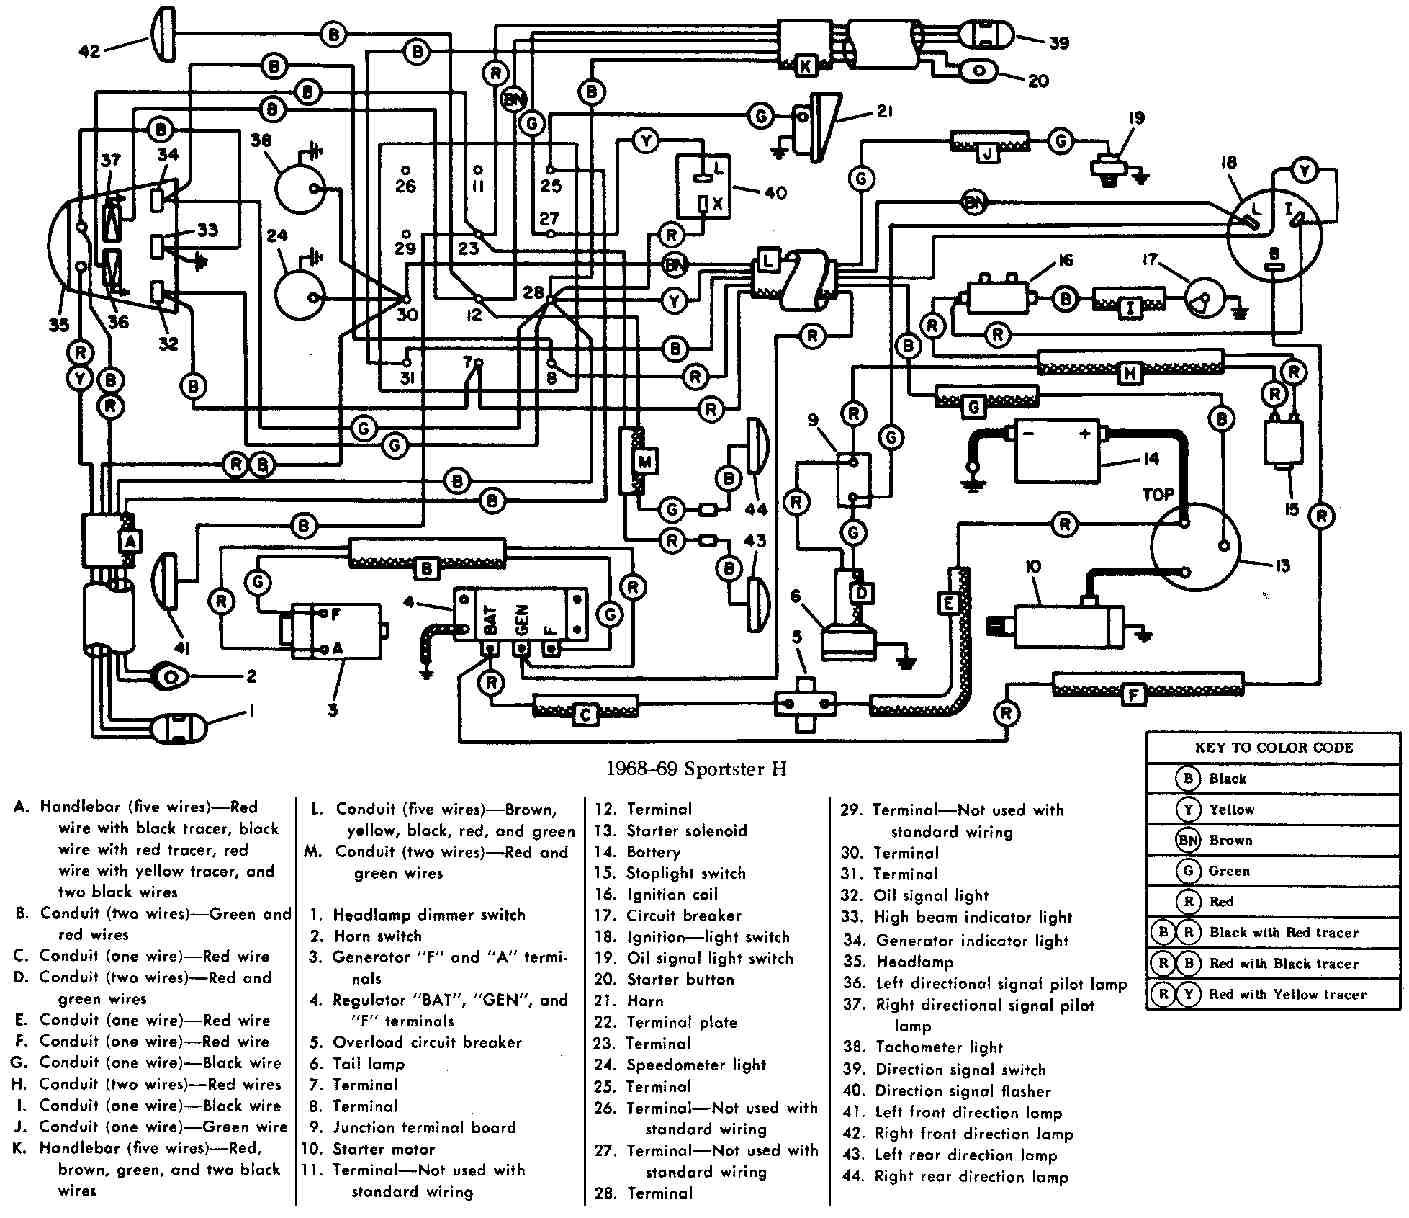 1968 chevelle wiring diagram ecklers 36 ima six sigma tree delco radio best library 1959 harley davidson diy diagrams u2022 rh aviomar co color